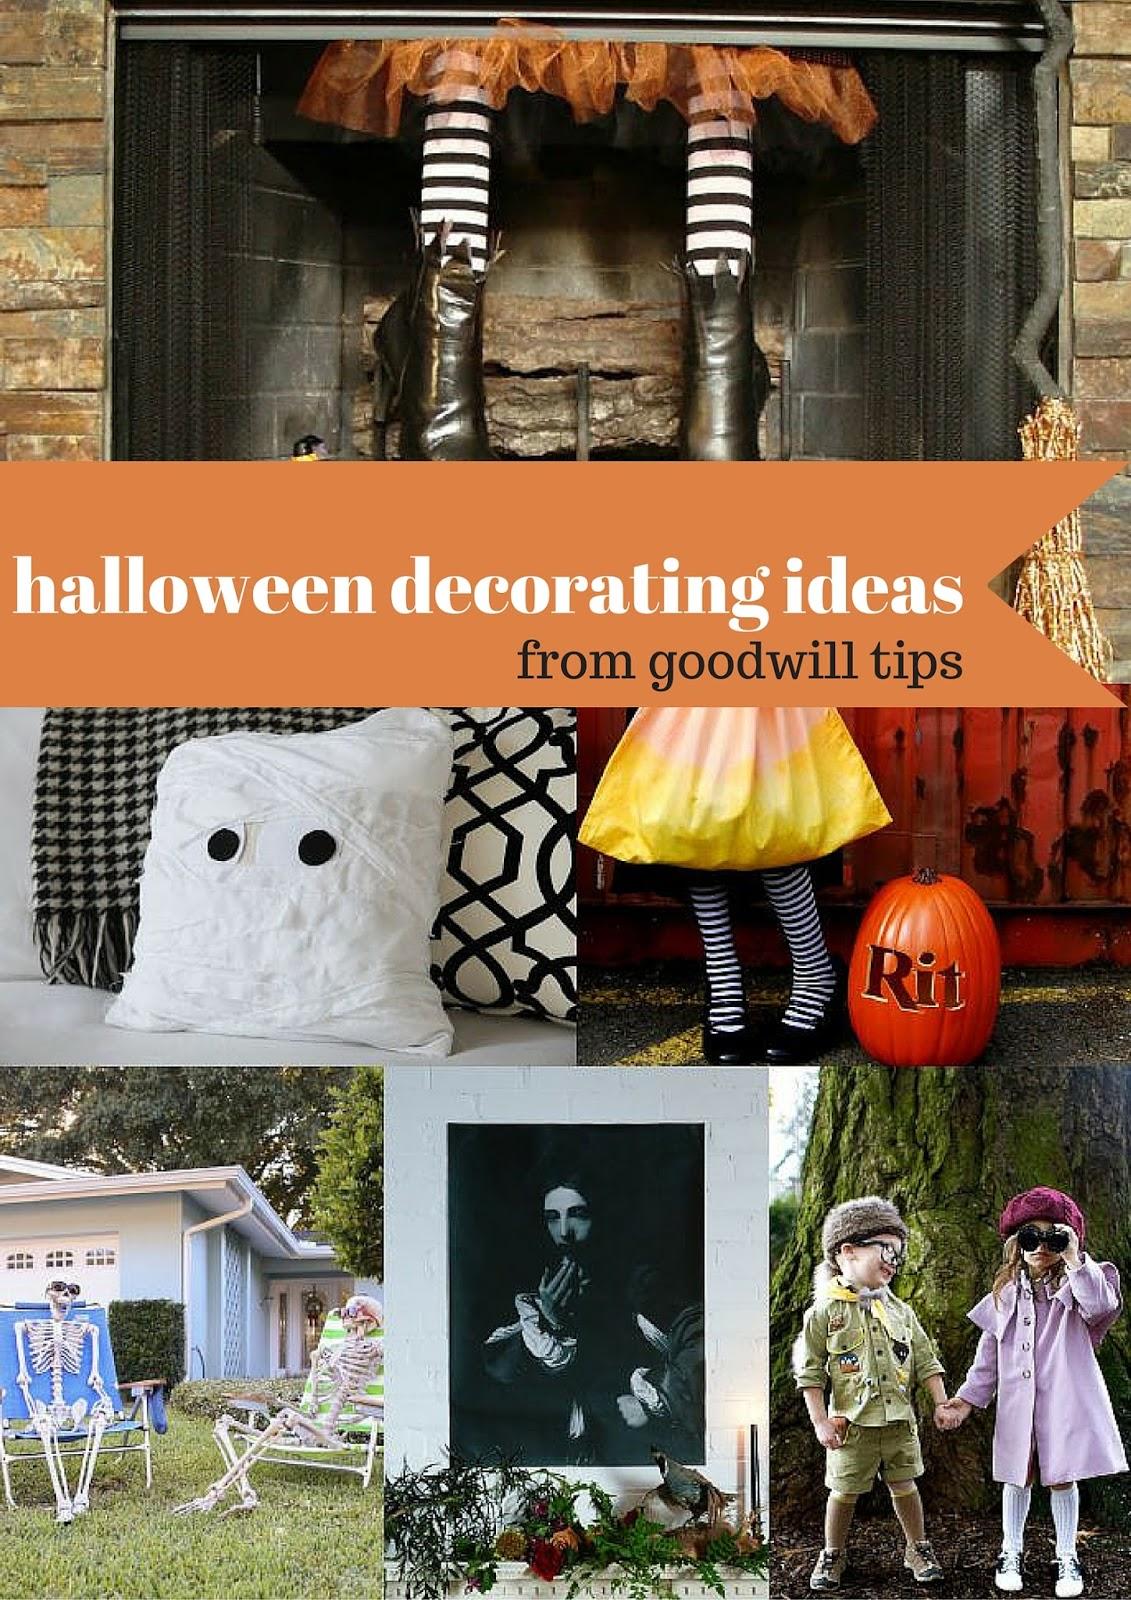 Goodwill Tips: 6 Festive Halloween Decorating Ideas